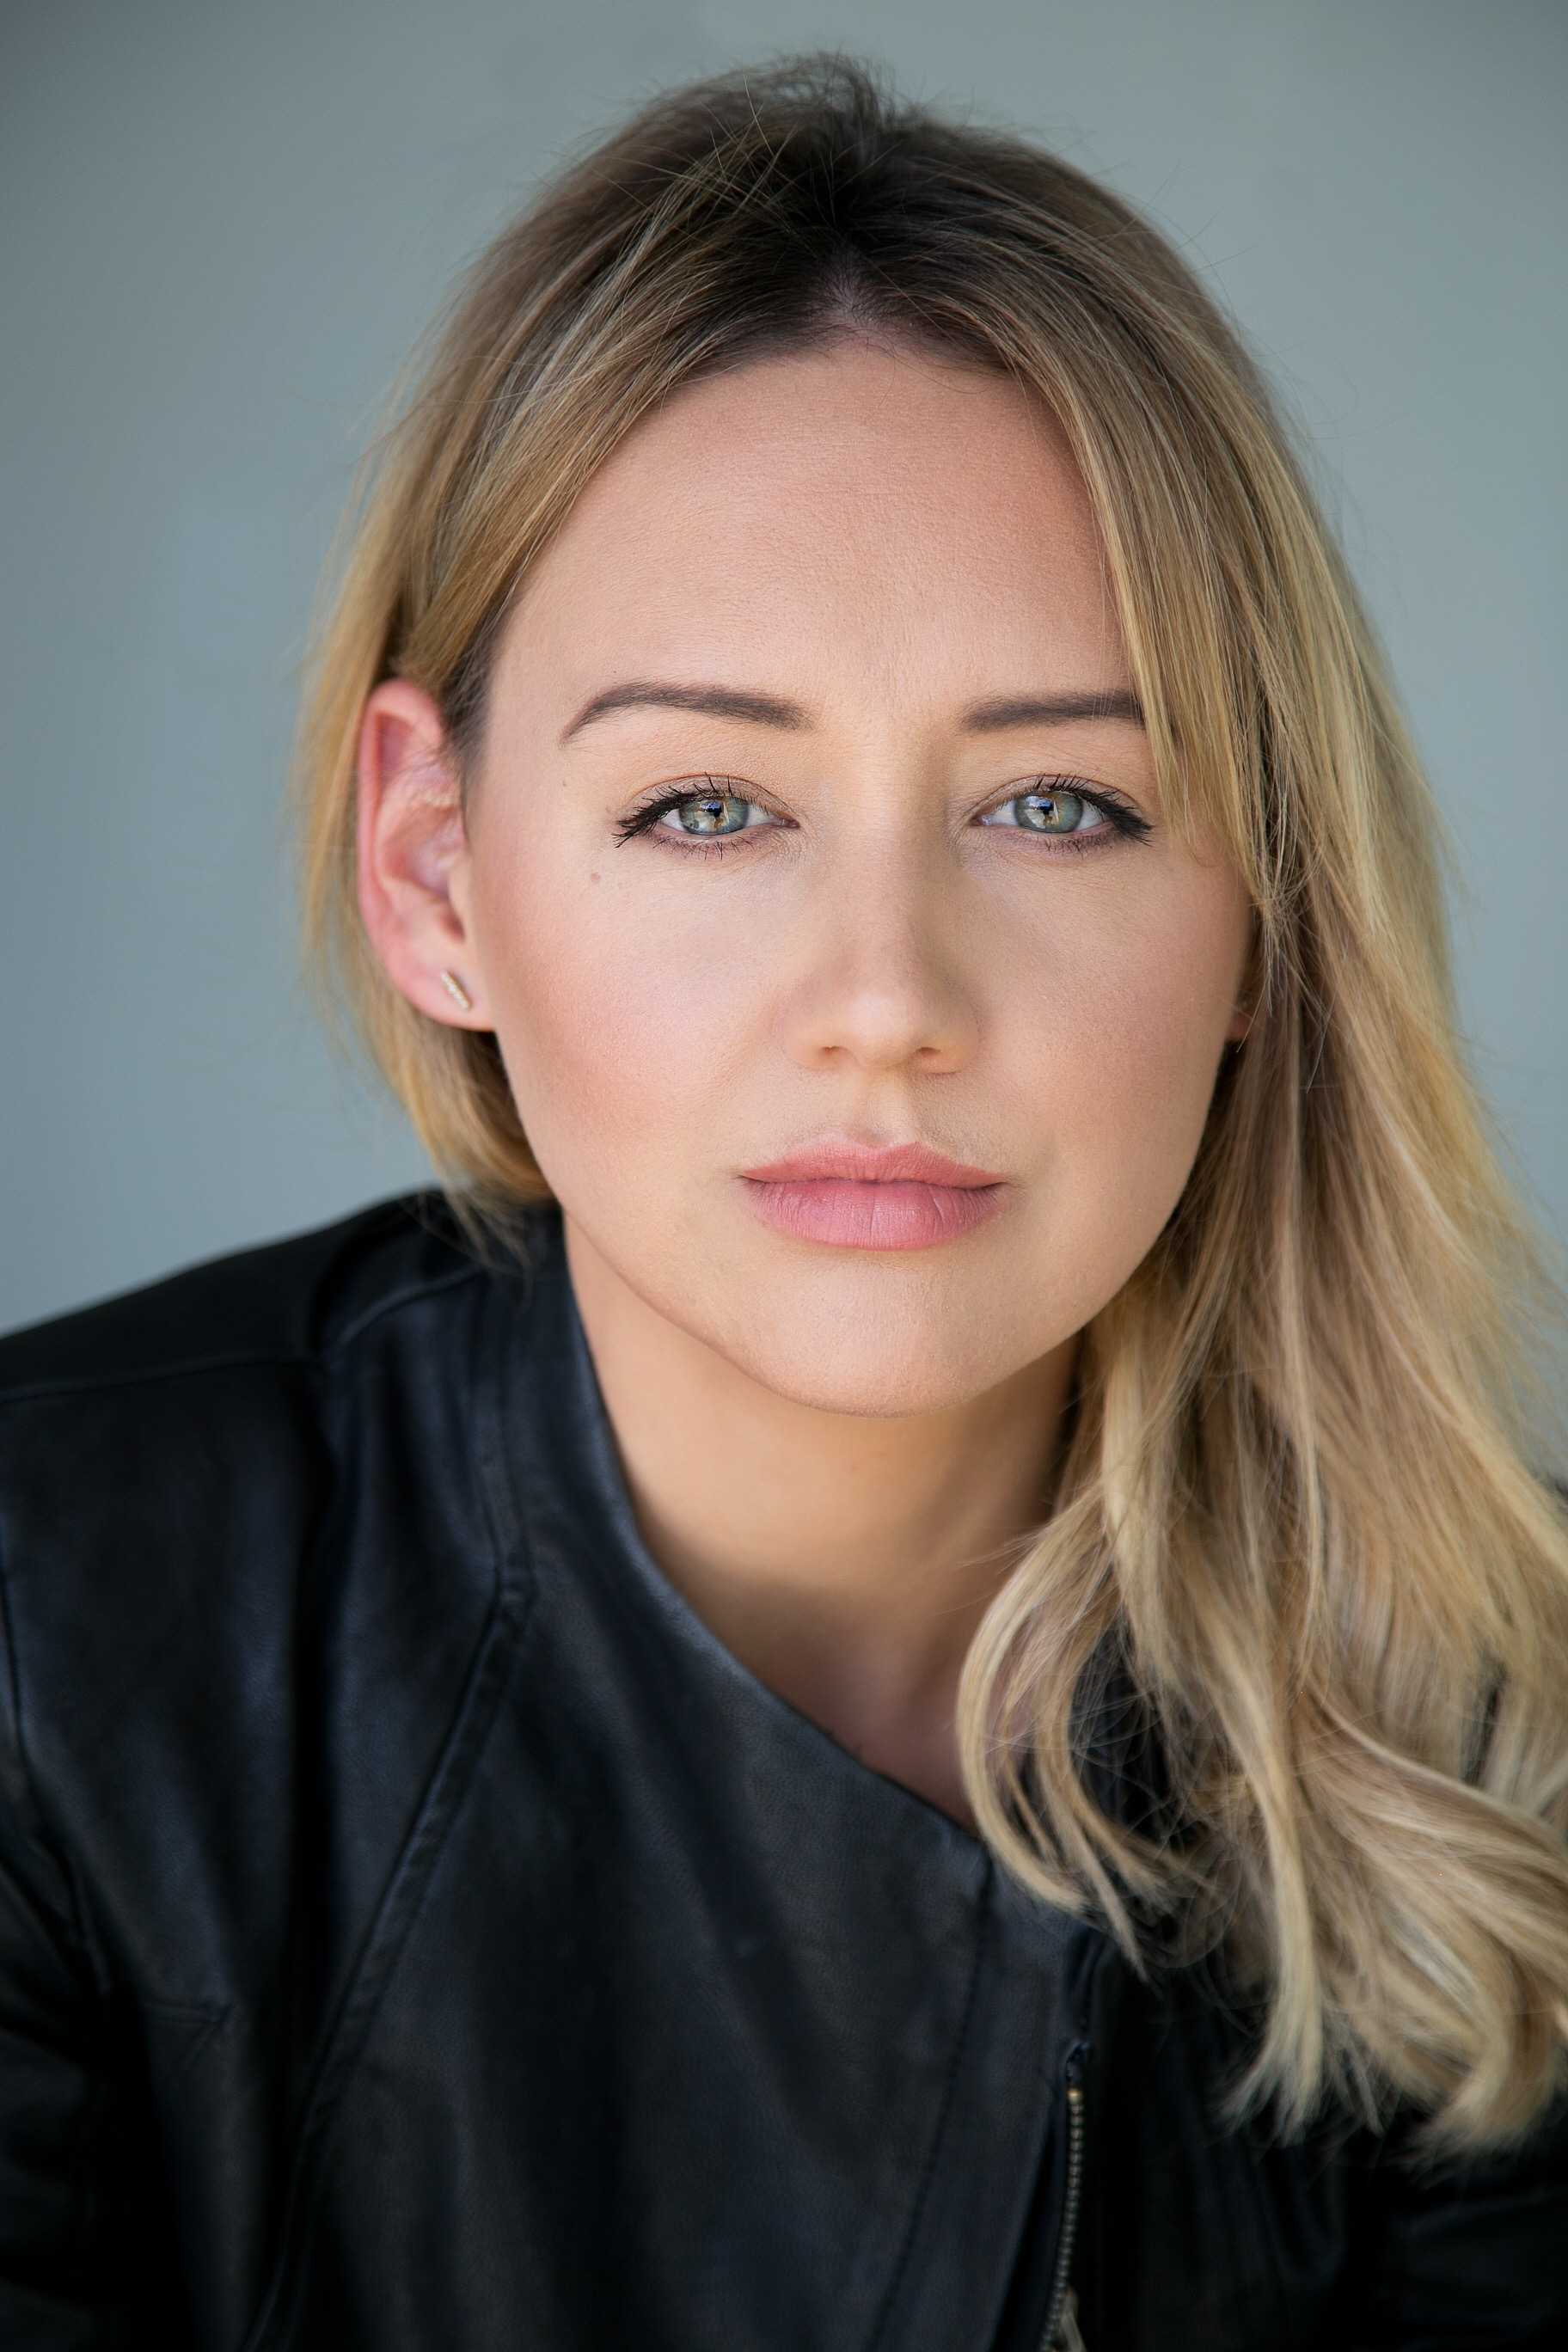 Brooke Coleman From Istunt